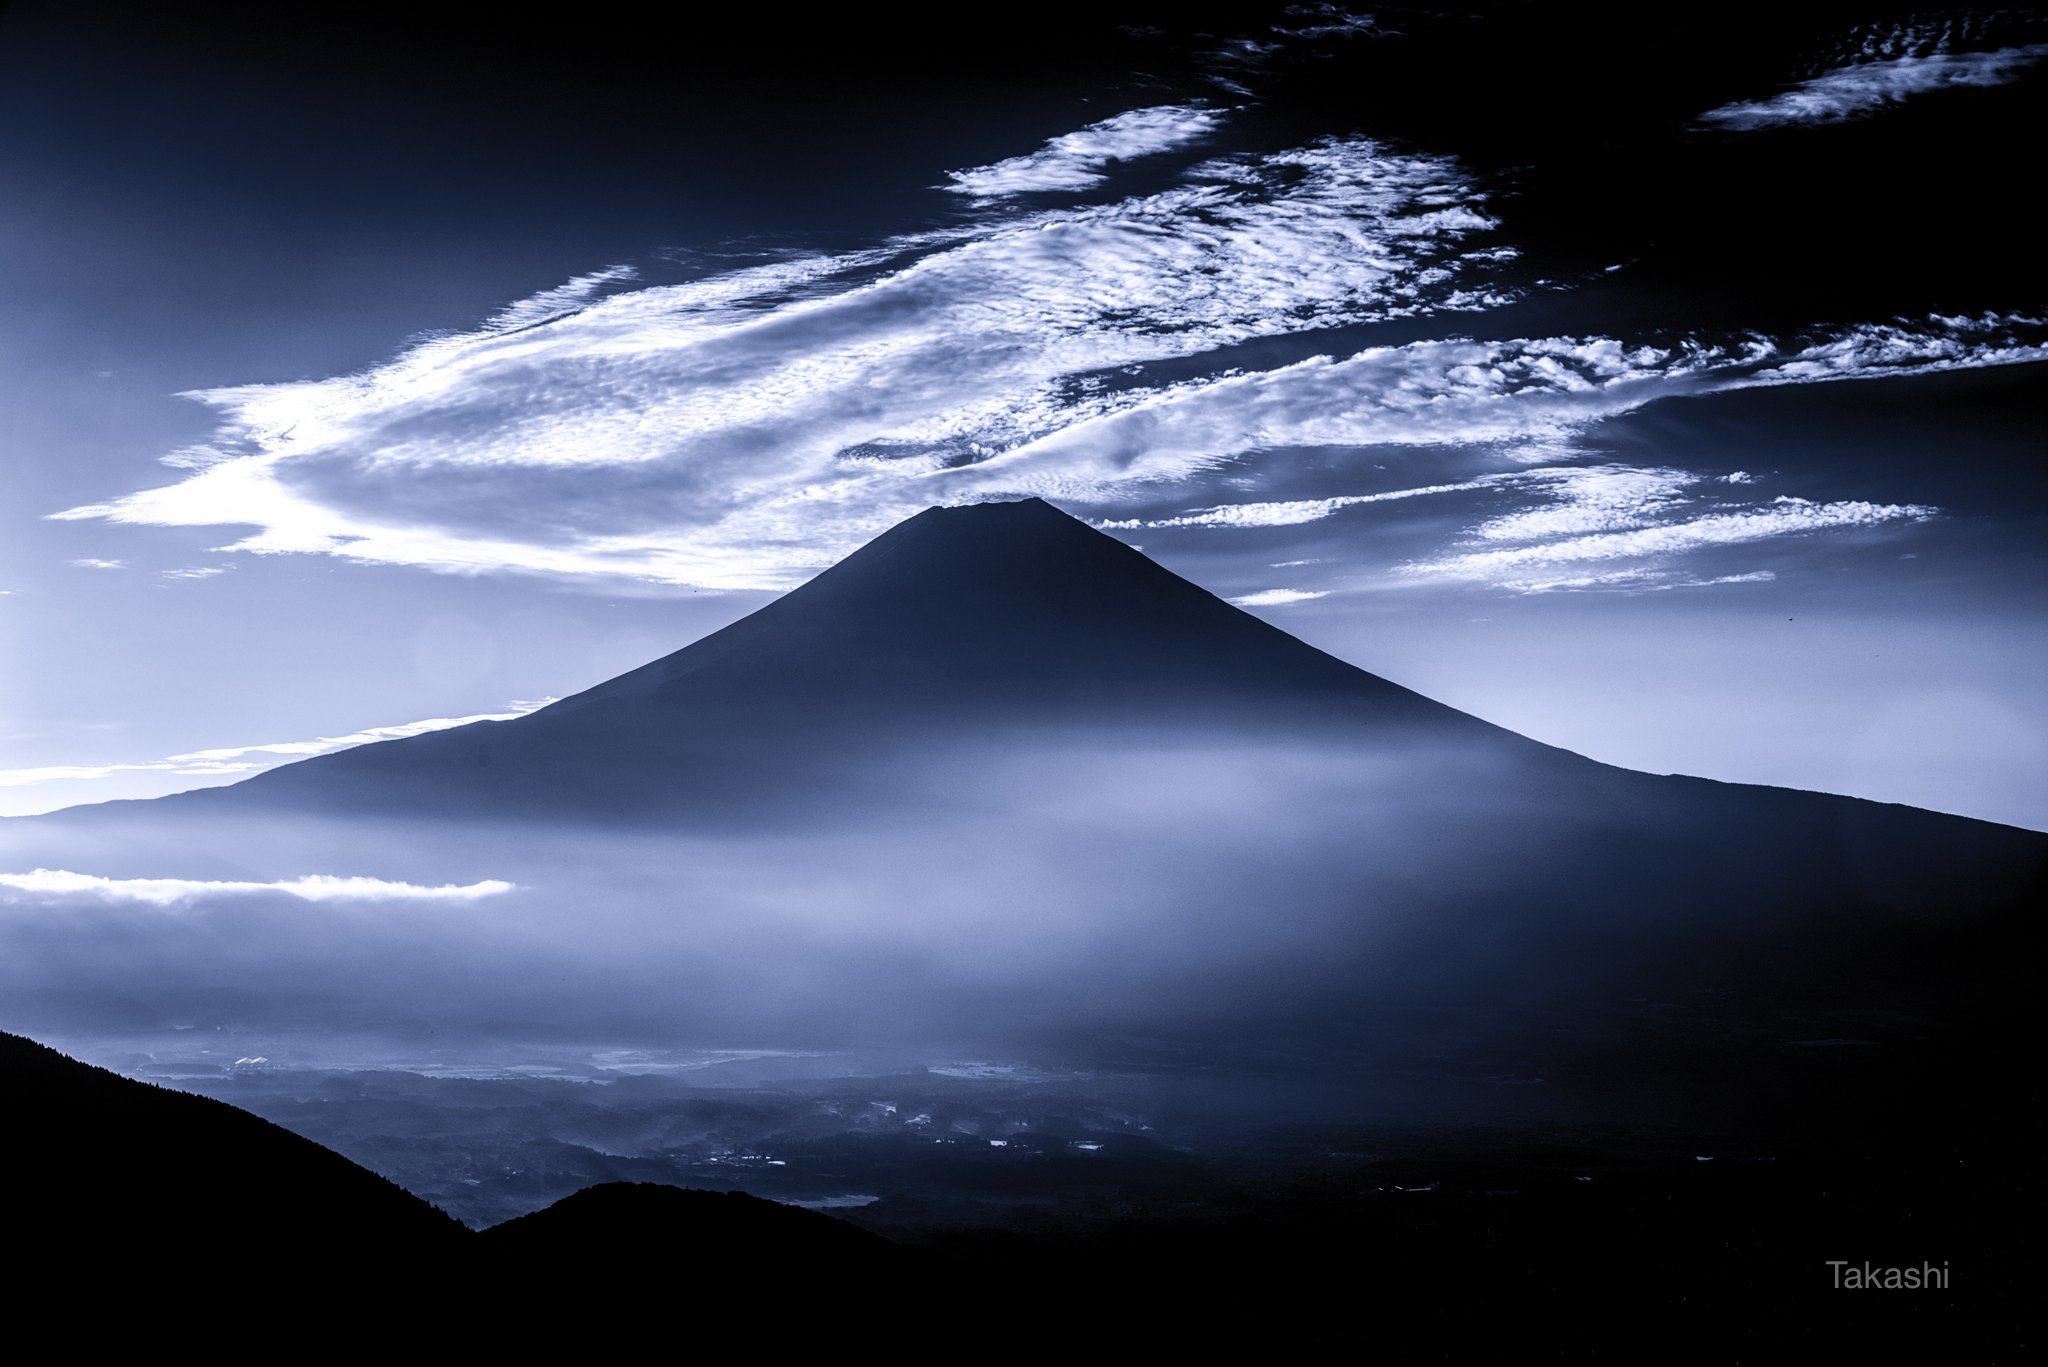 Fuji,Japan,mountain,cloud,sky,landscape,blue,white,amazing,wonderful,beautiful,, Takashi